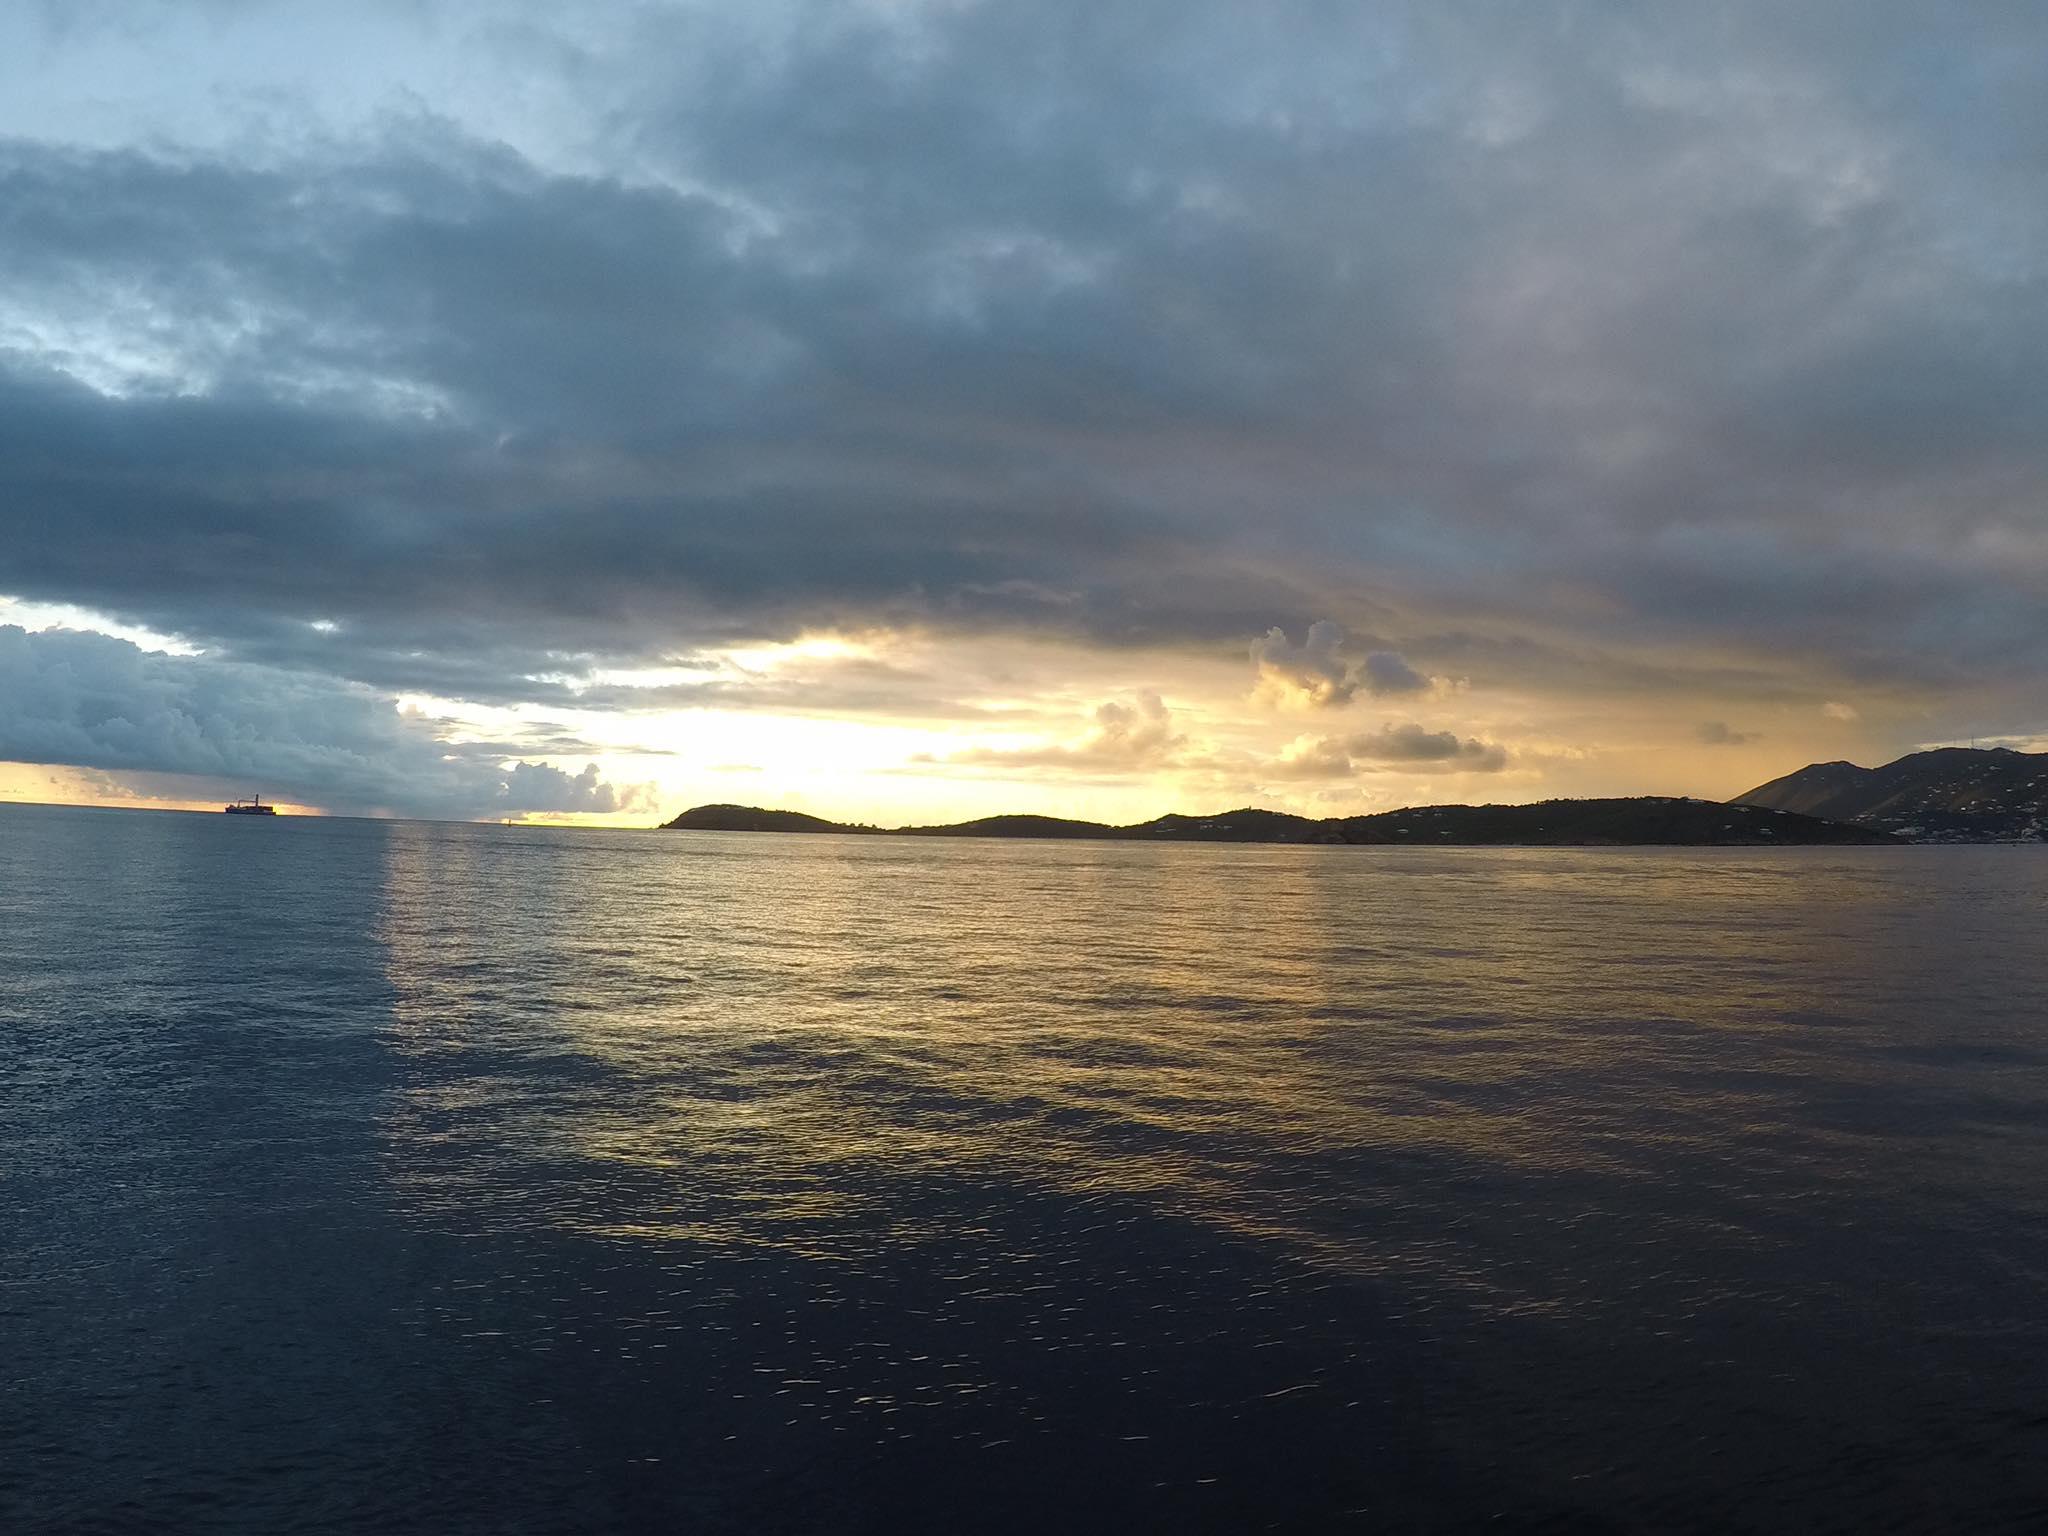 Sunset catamaran sail